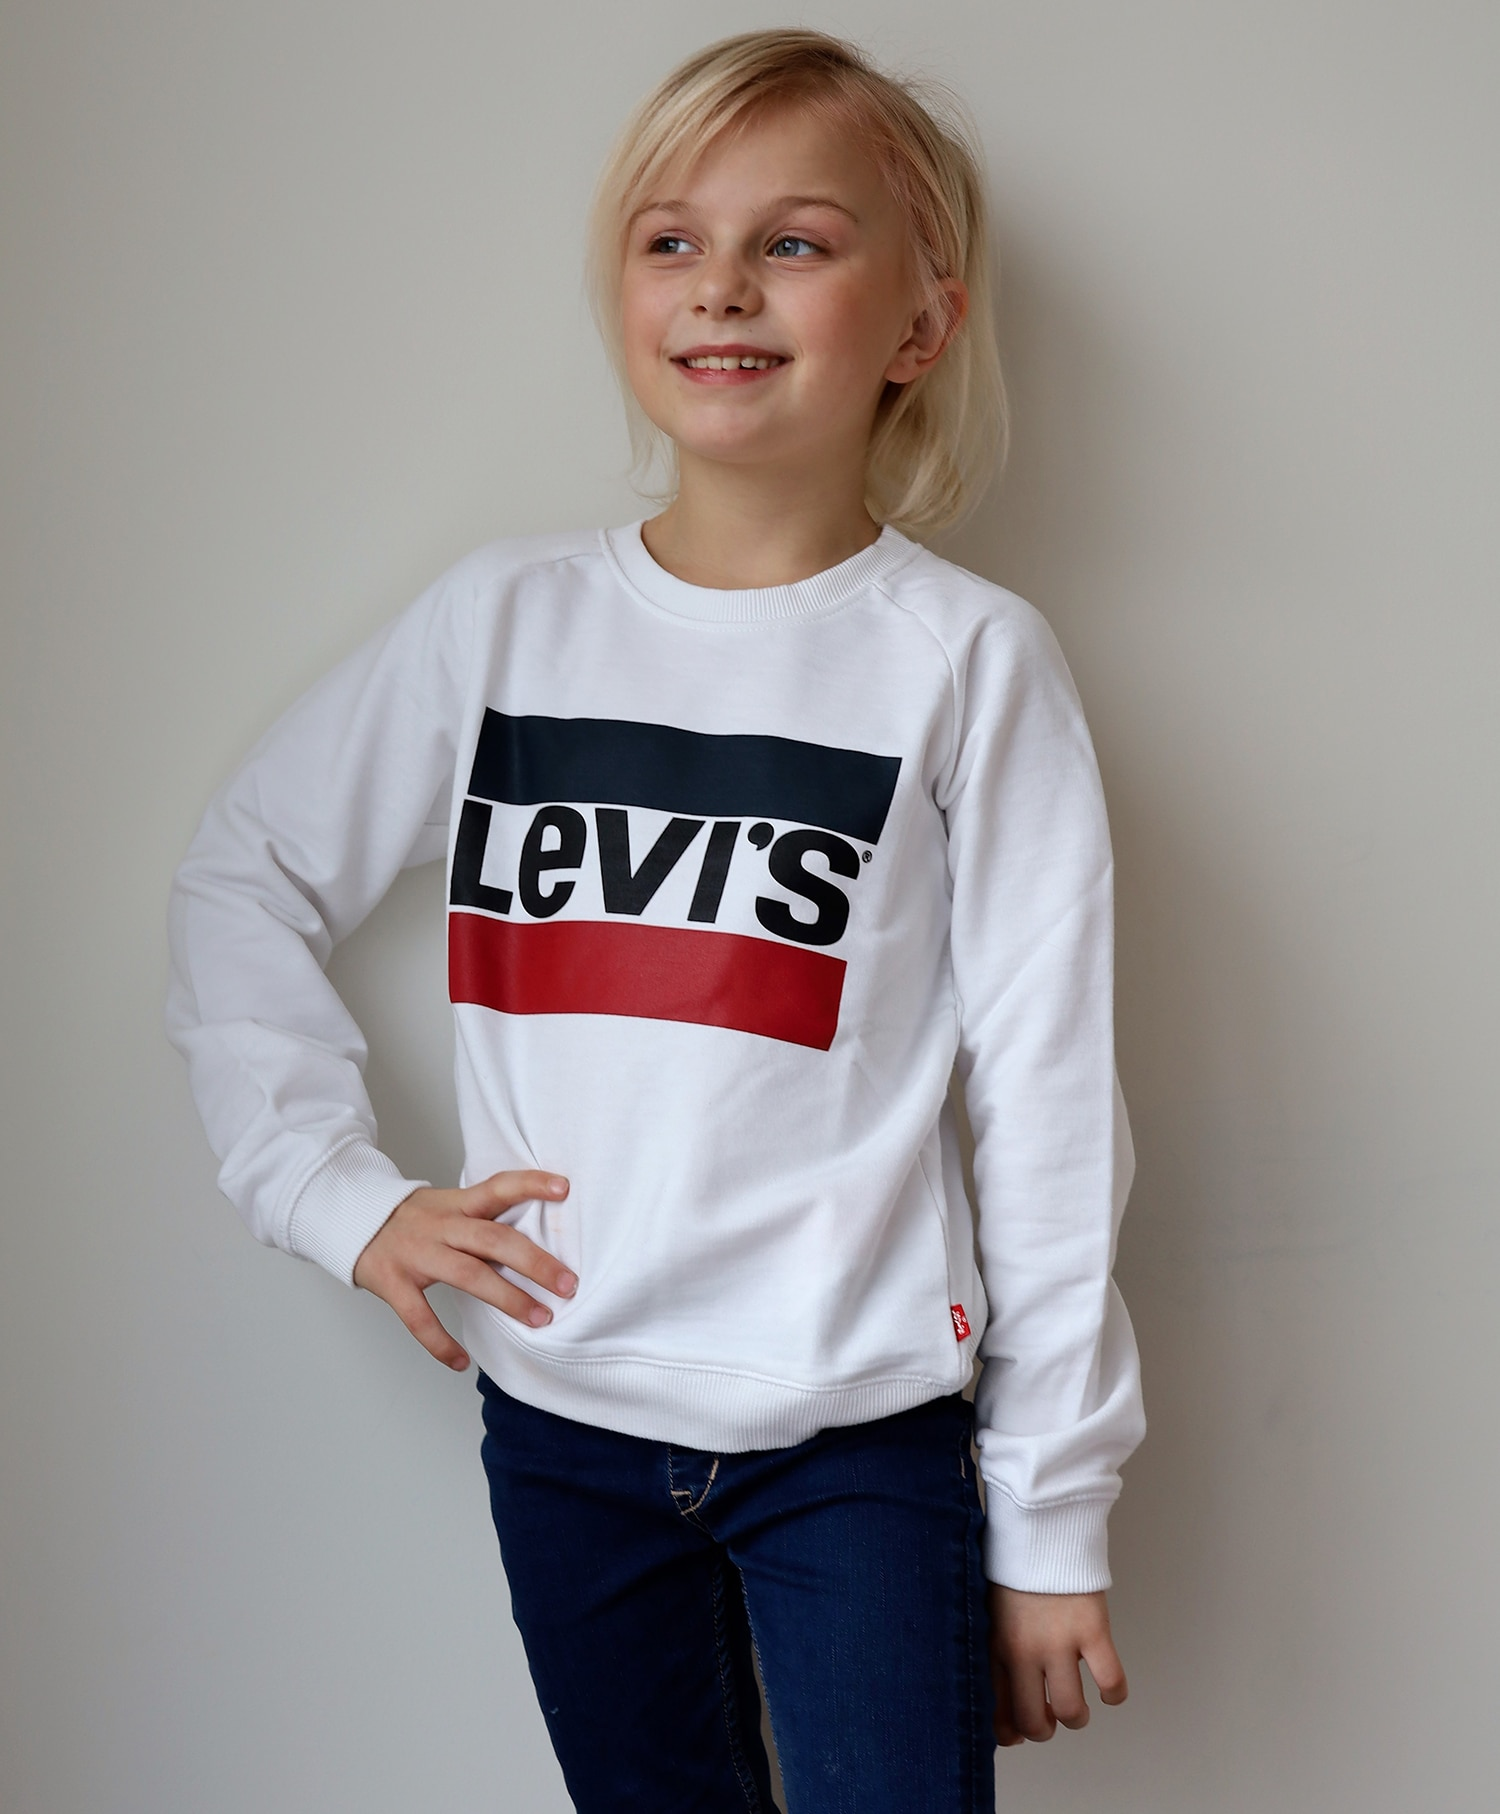 Levi's college genser